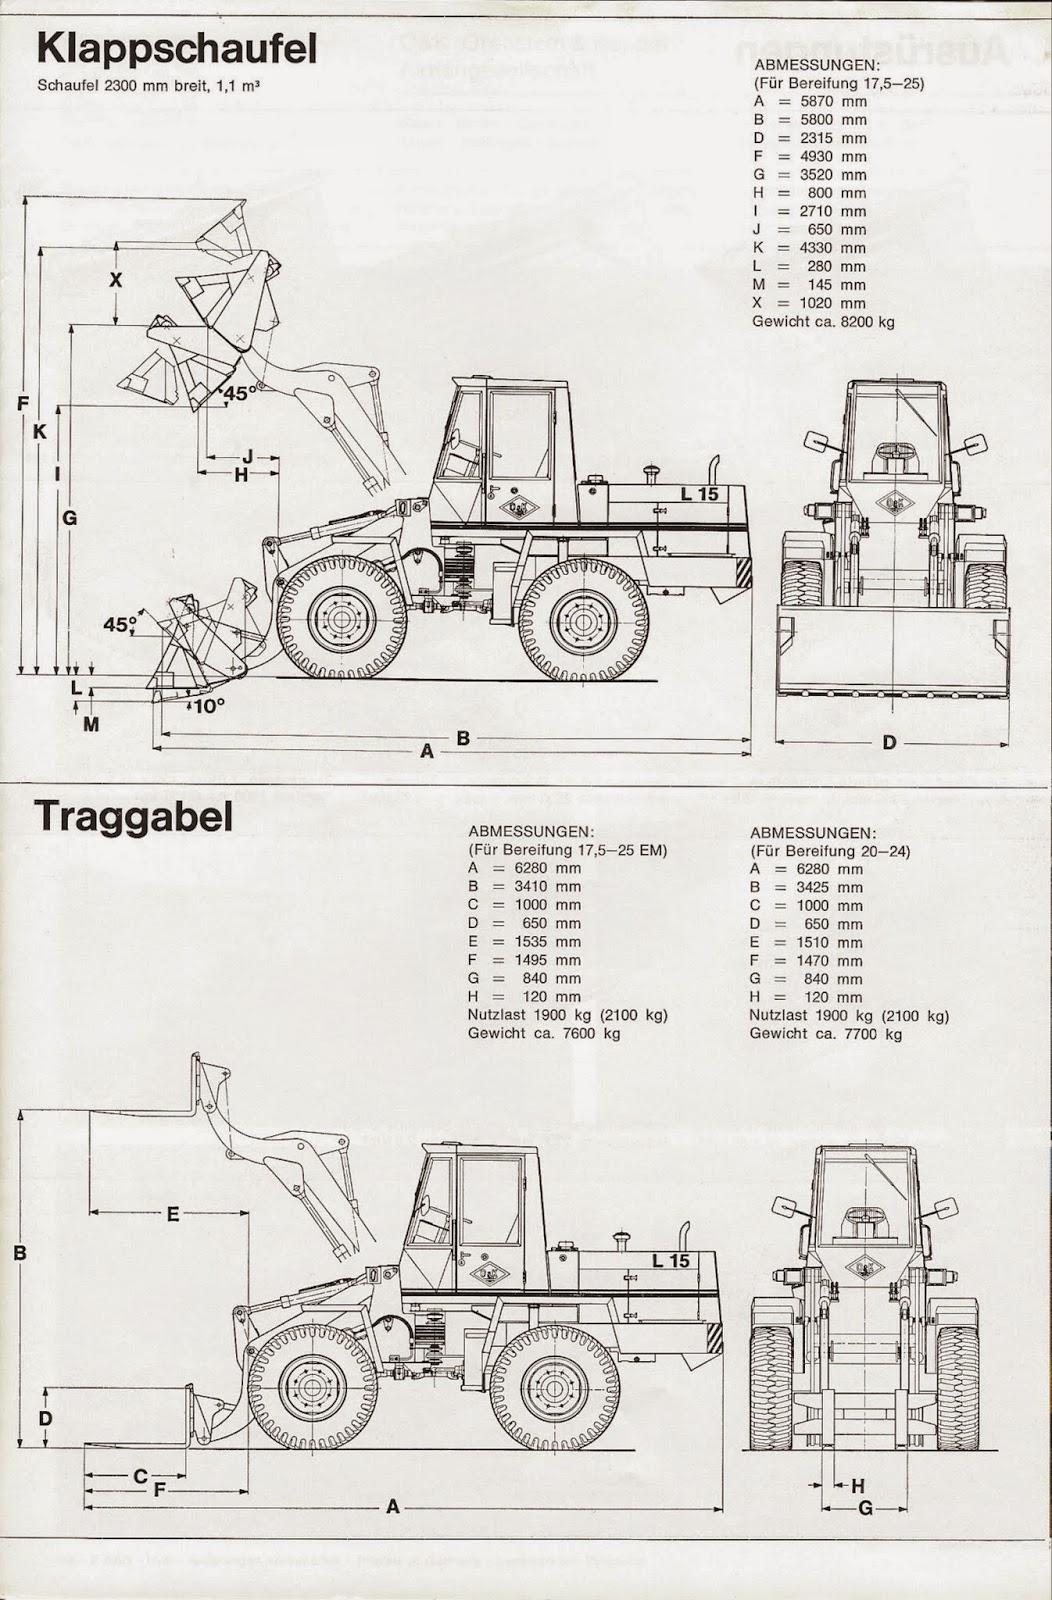 RS-O&K Baumaschinen: O&K L15